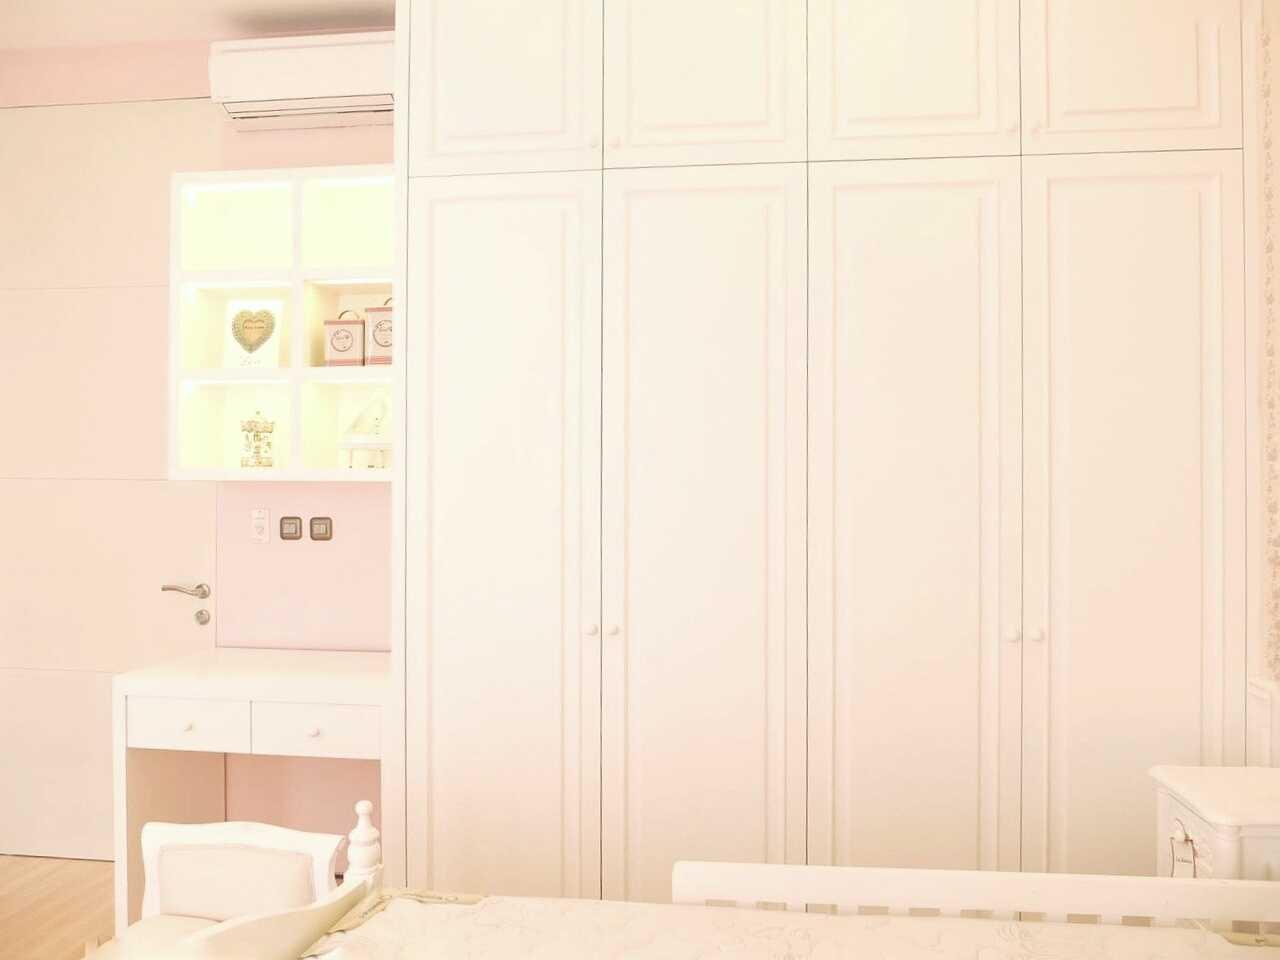 7Design Architect Mrs. D House Citrasun, Yogjakarta Citrasun, Yogjakarta Bedroom Area Klasik 18705